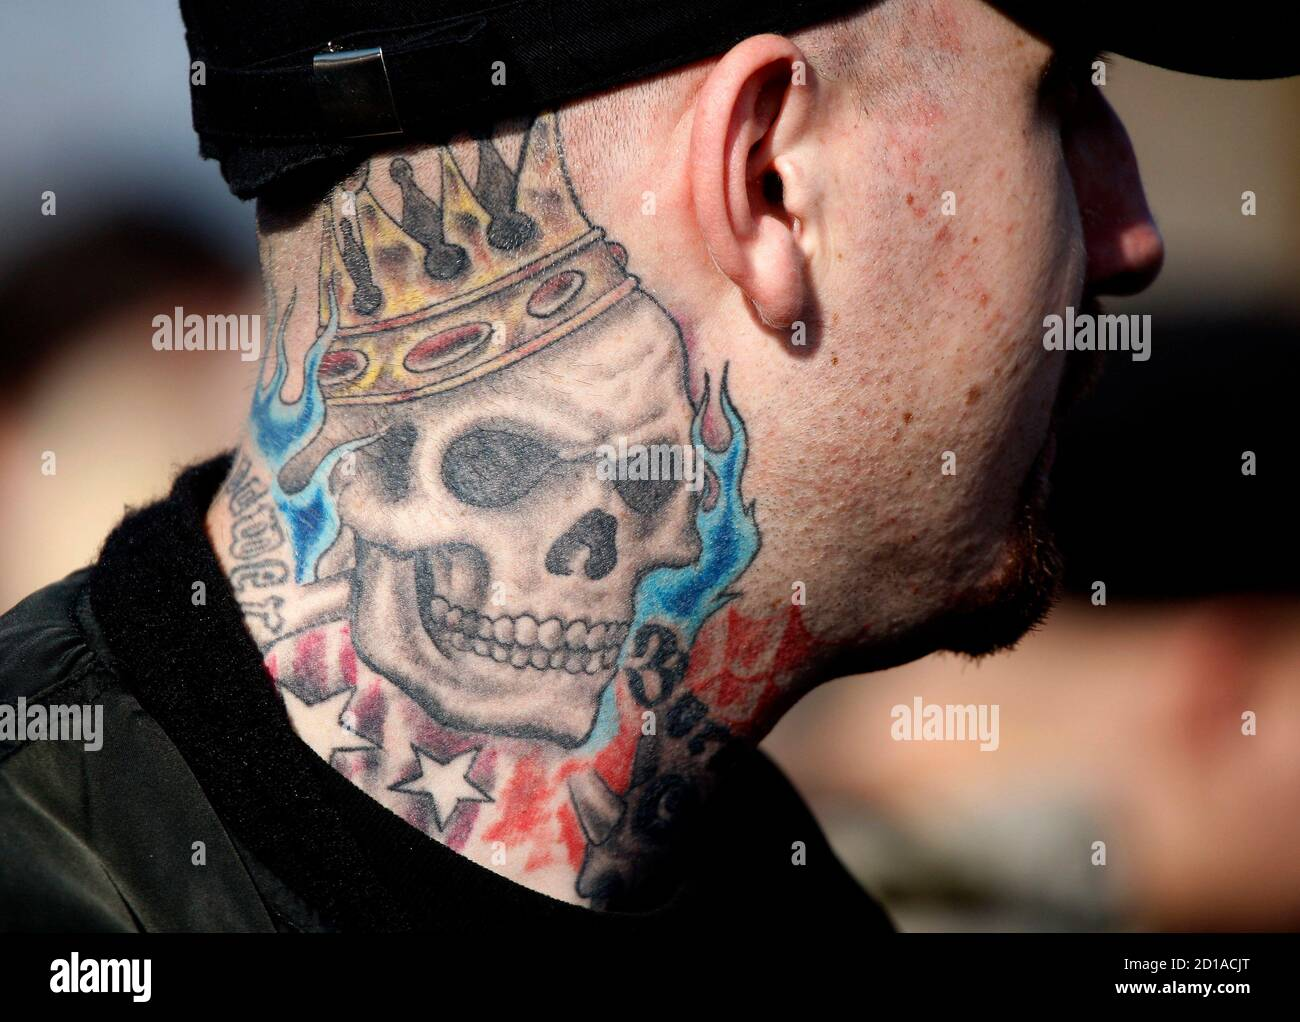 Skinhead designs crucified tattoo Hate Symbols